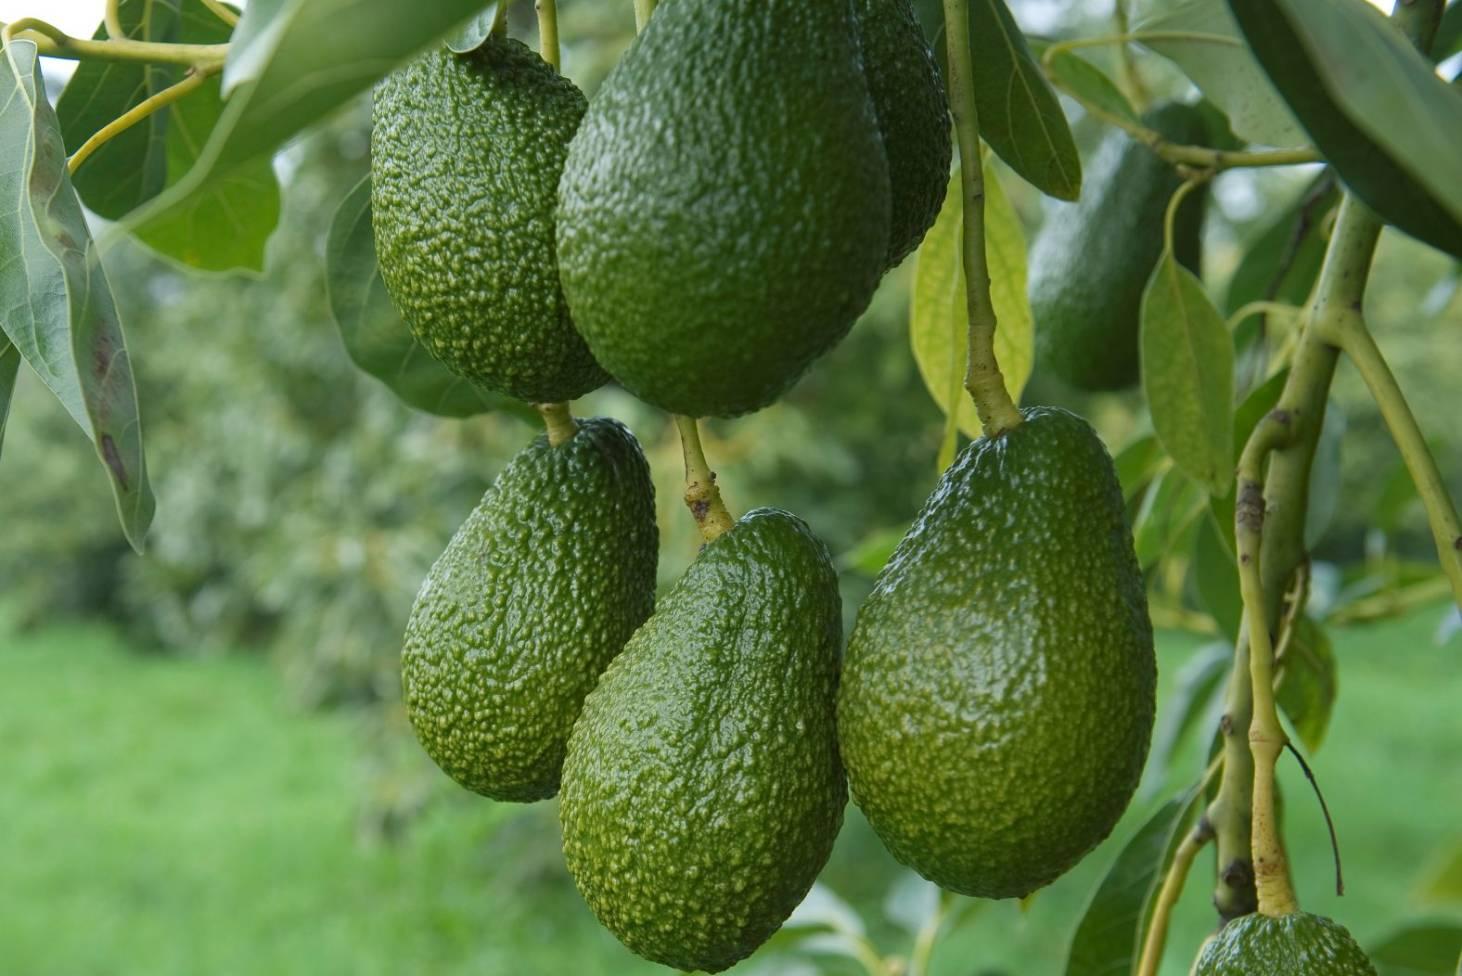 Grow avocado: plant, care & harvest | Stuff co nz